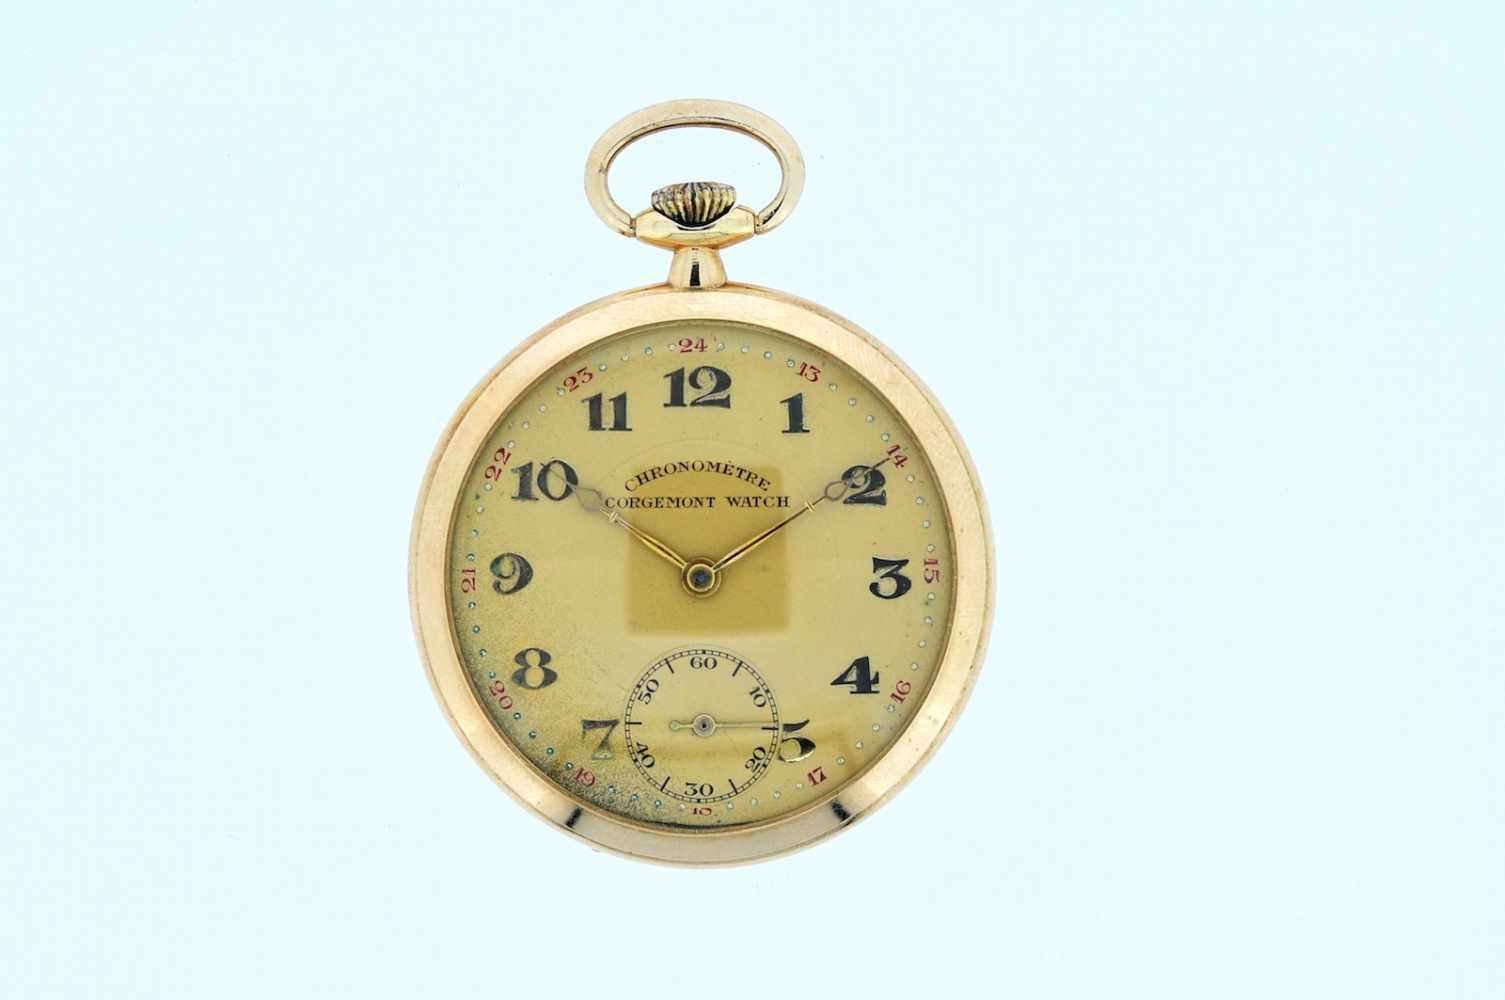 Goldene Frackuhr Goldene Frackuhr mit kleiner Sekunde, Chronometer, Corgemont Watch, Breguetspirale,